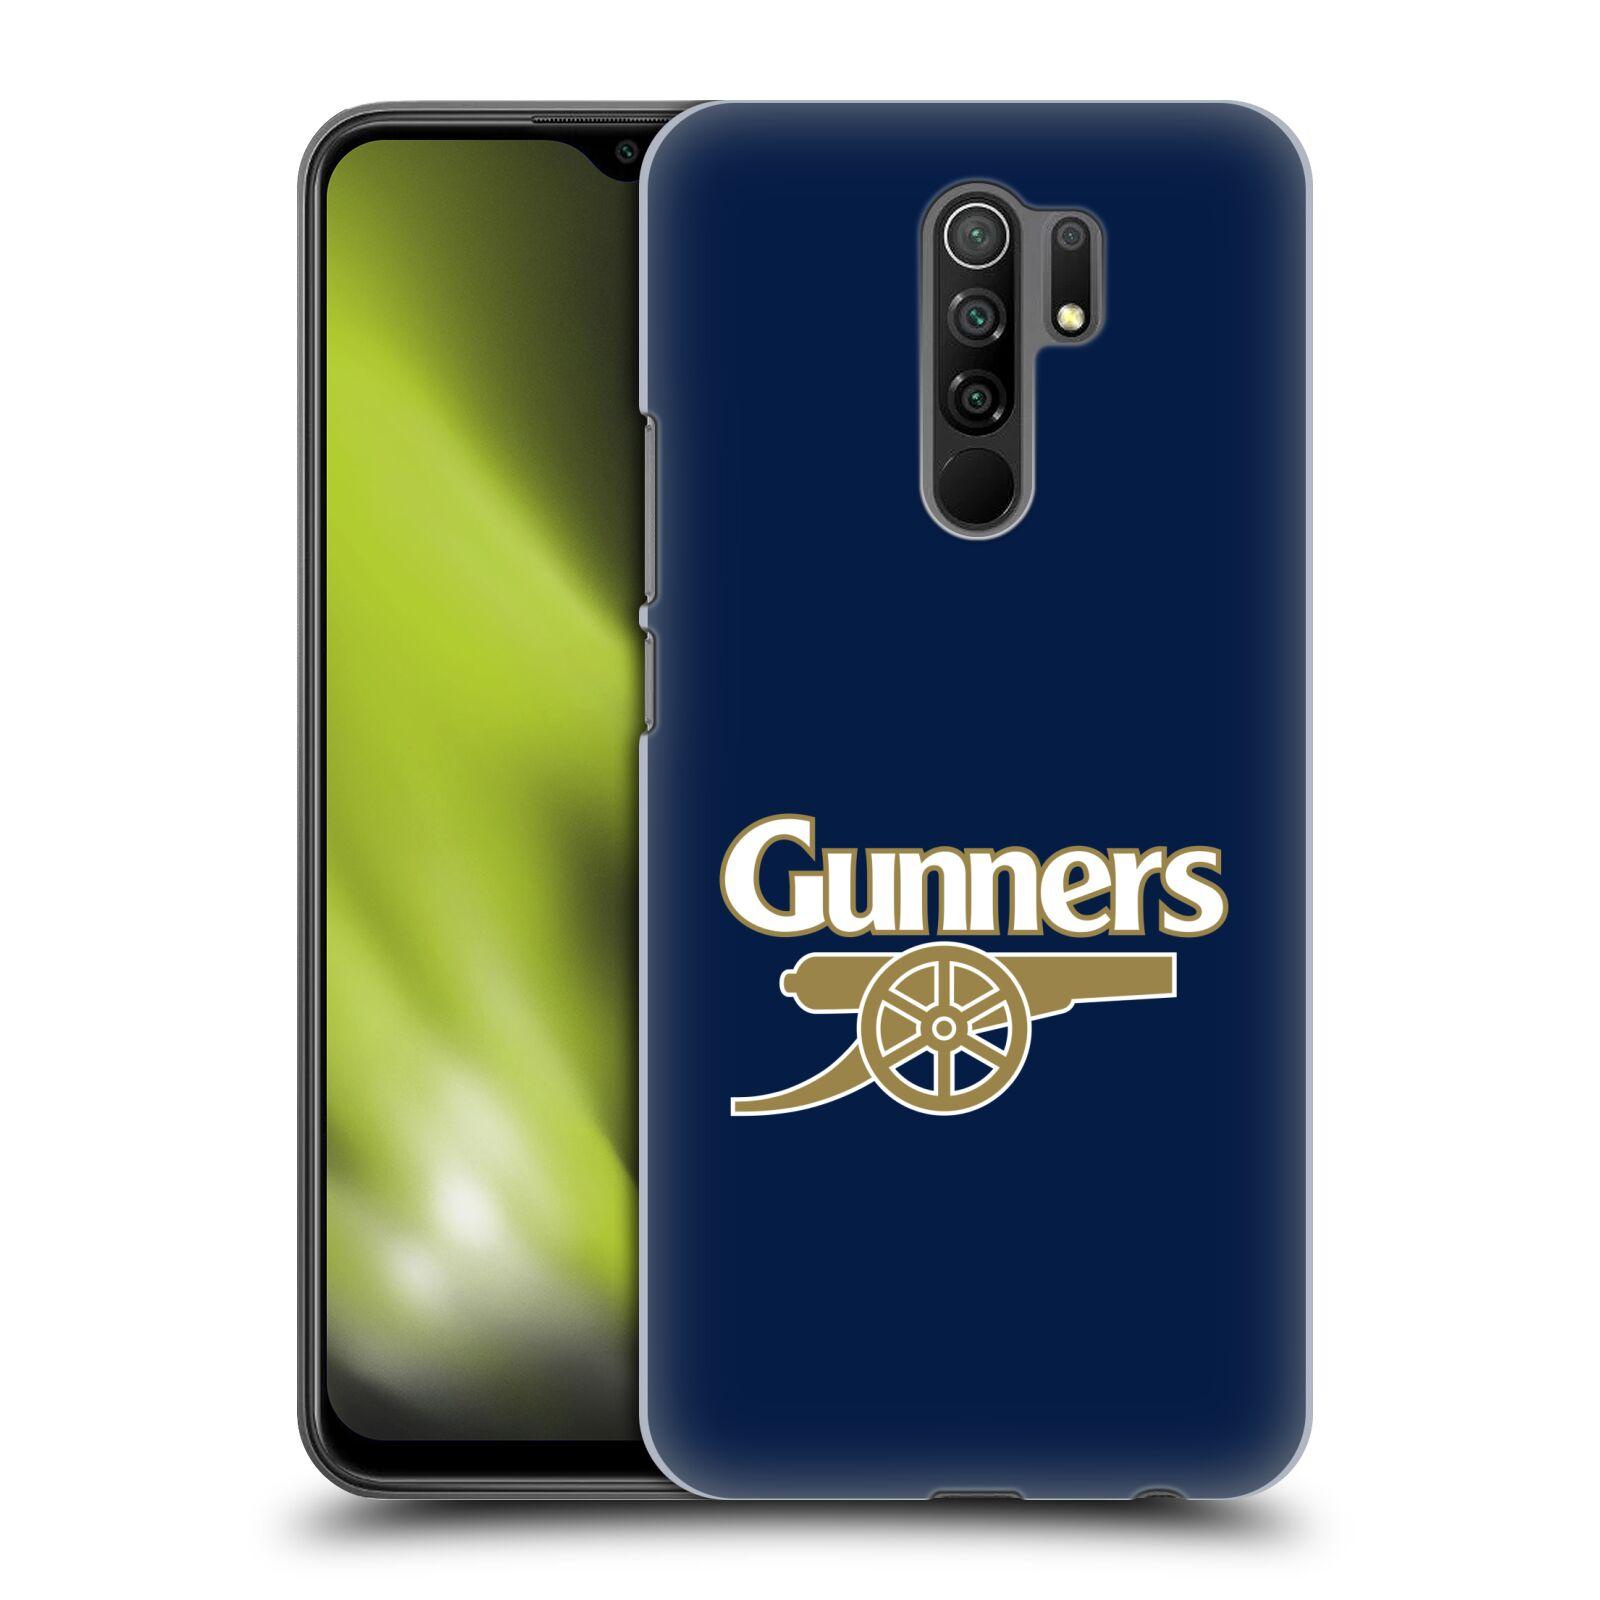 Plastové pouzdro na mobil Xiaomi Redmi 9 - Head Case - Arsenal FC - Gunners